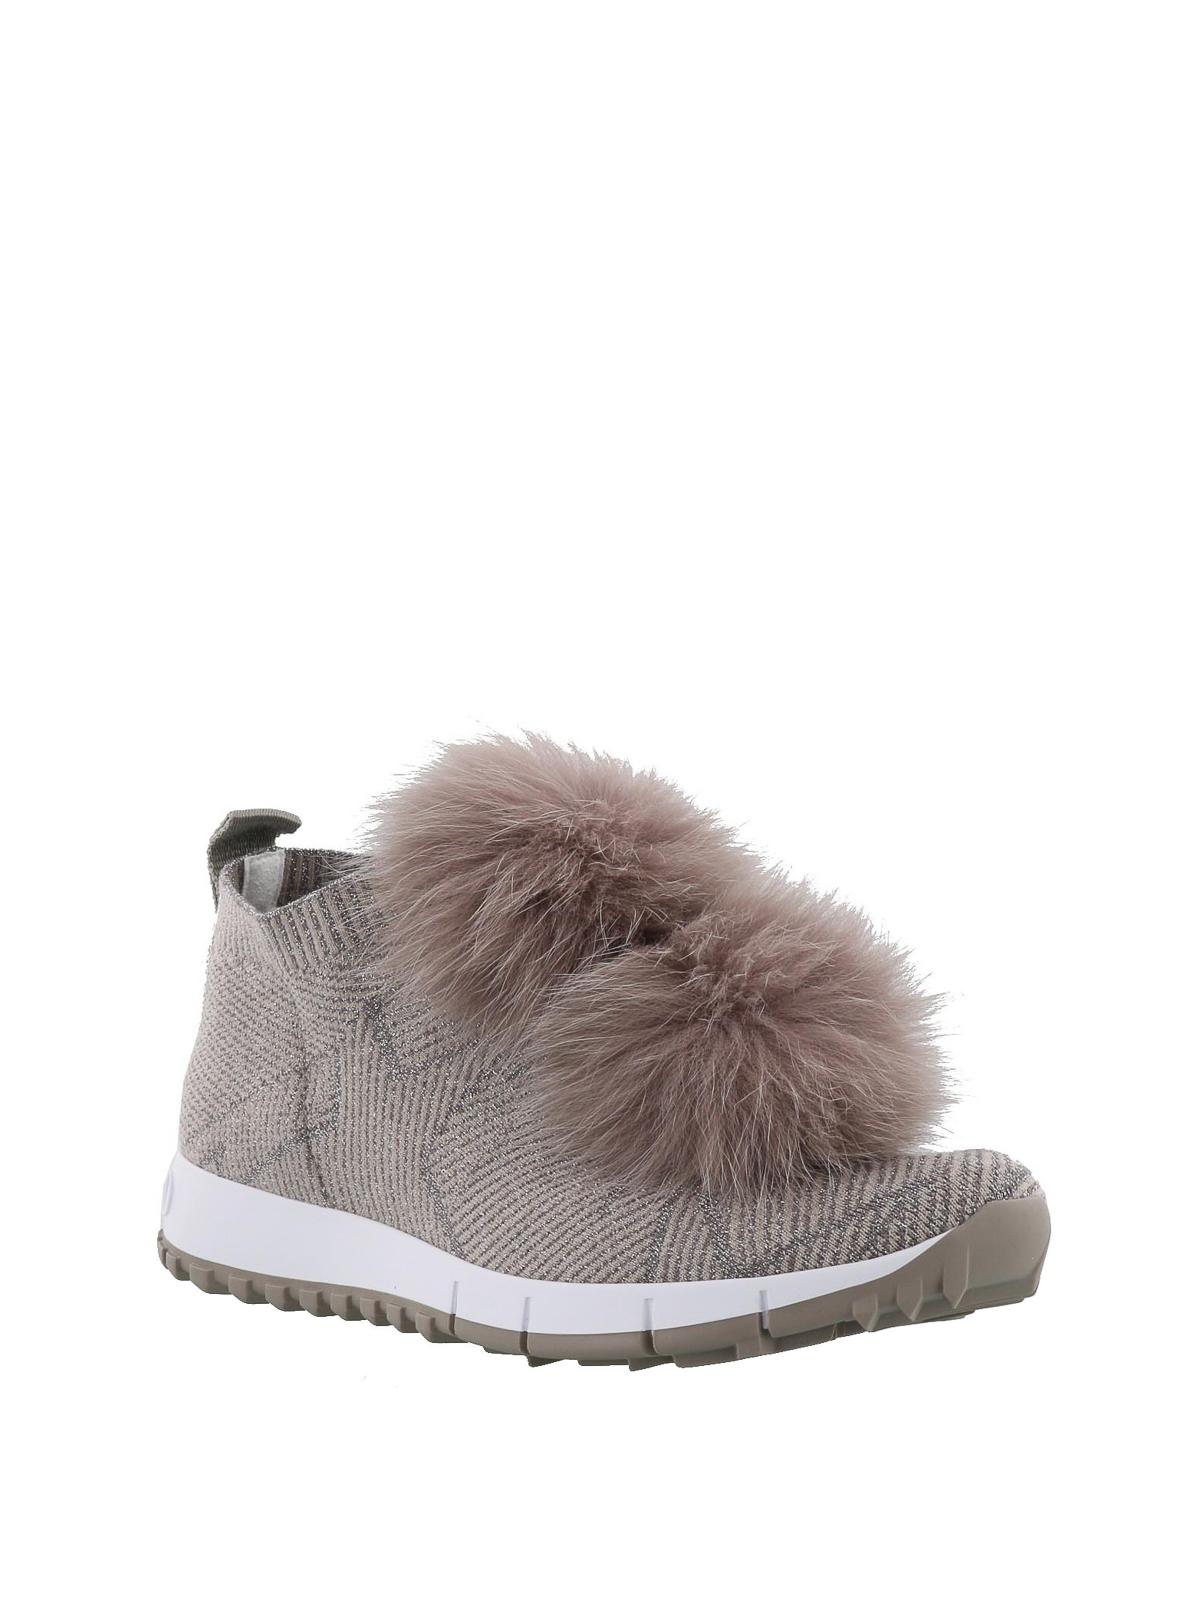 d87206266d96 JIMMY CHOO  trainers online - Norway fox fur pompom slip-on shoes